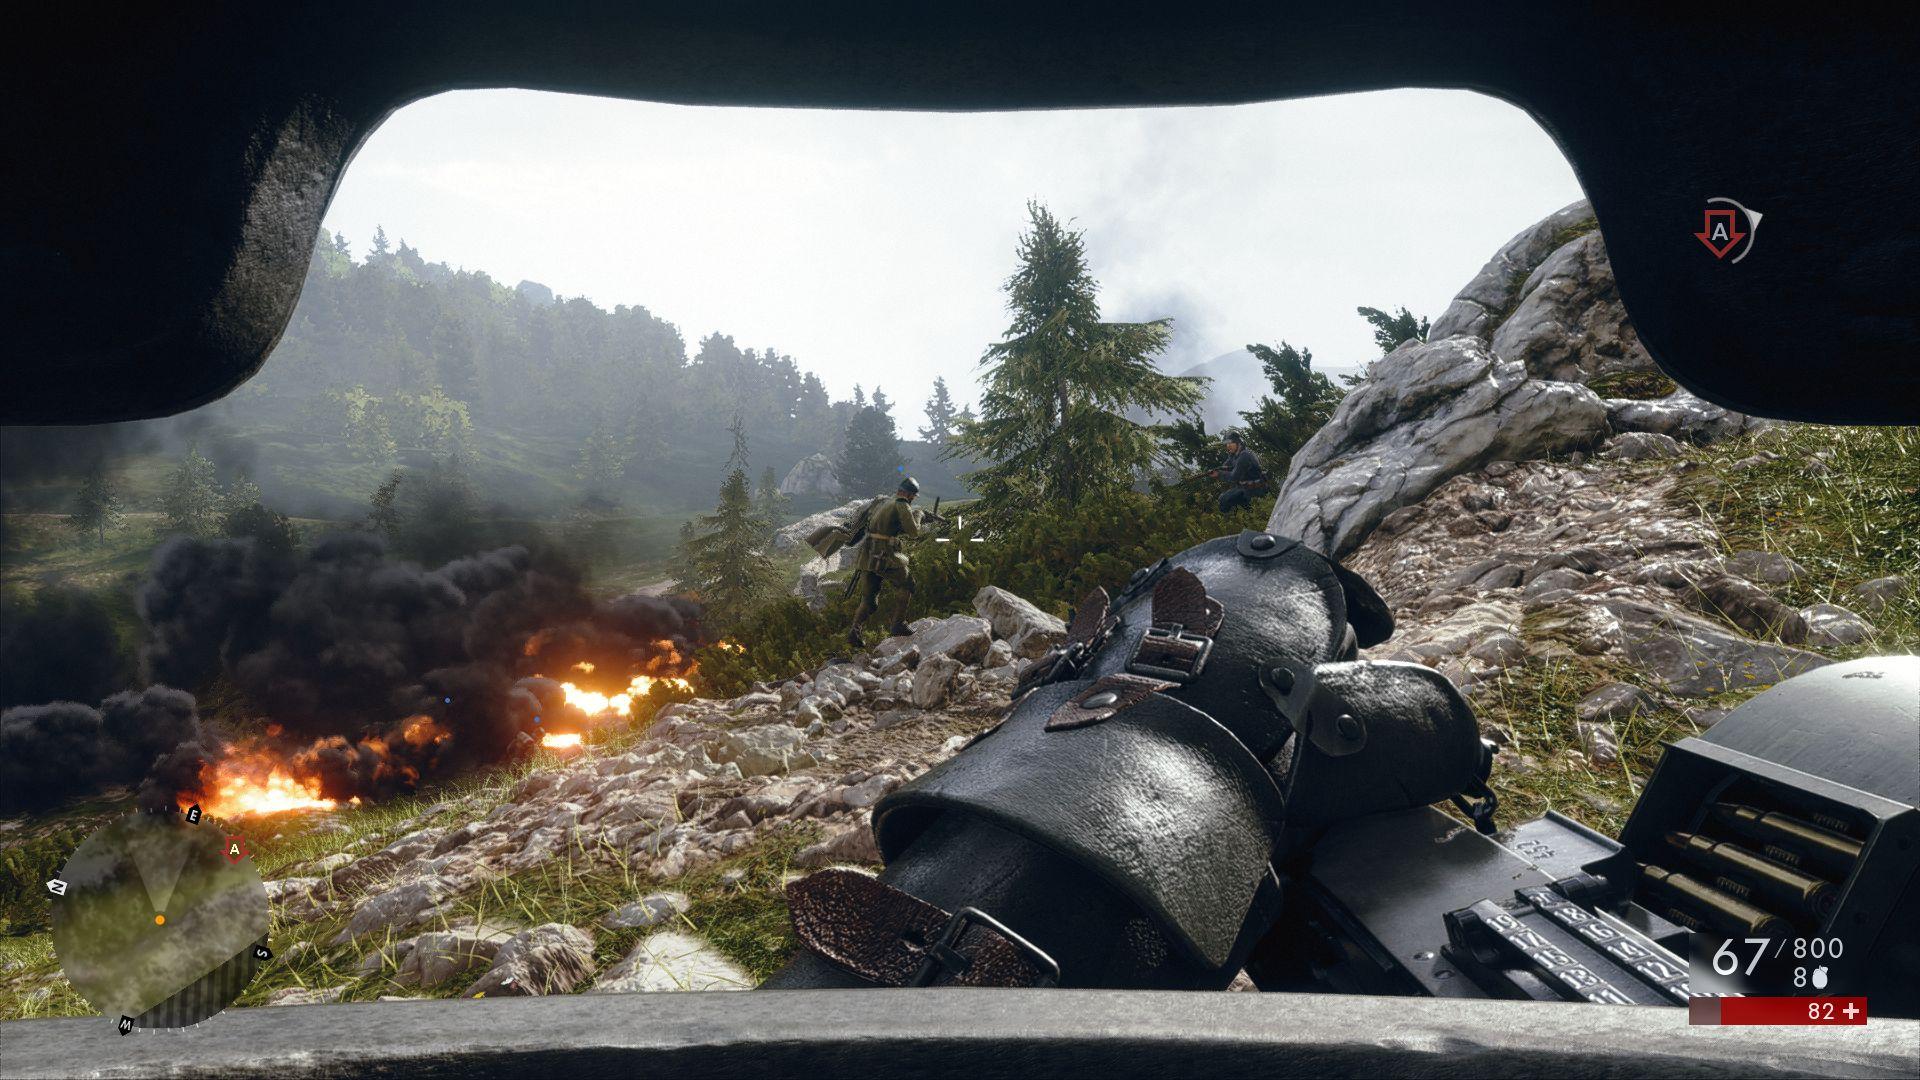 battlefield 1 излишне фантастичная броня